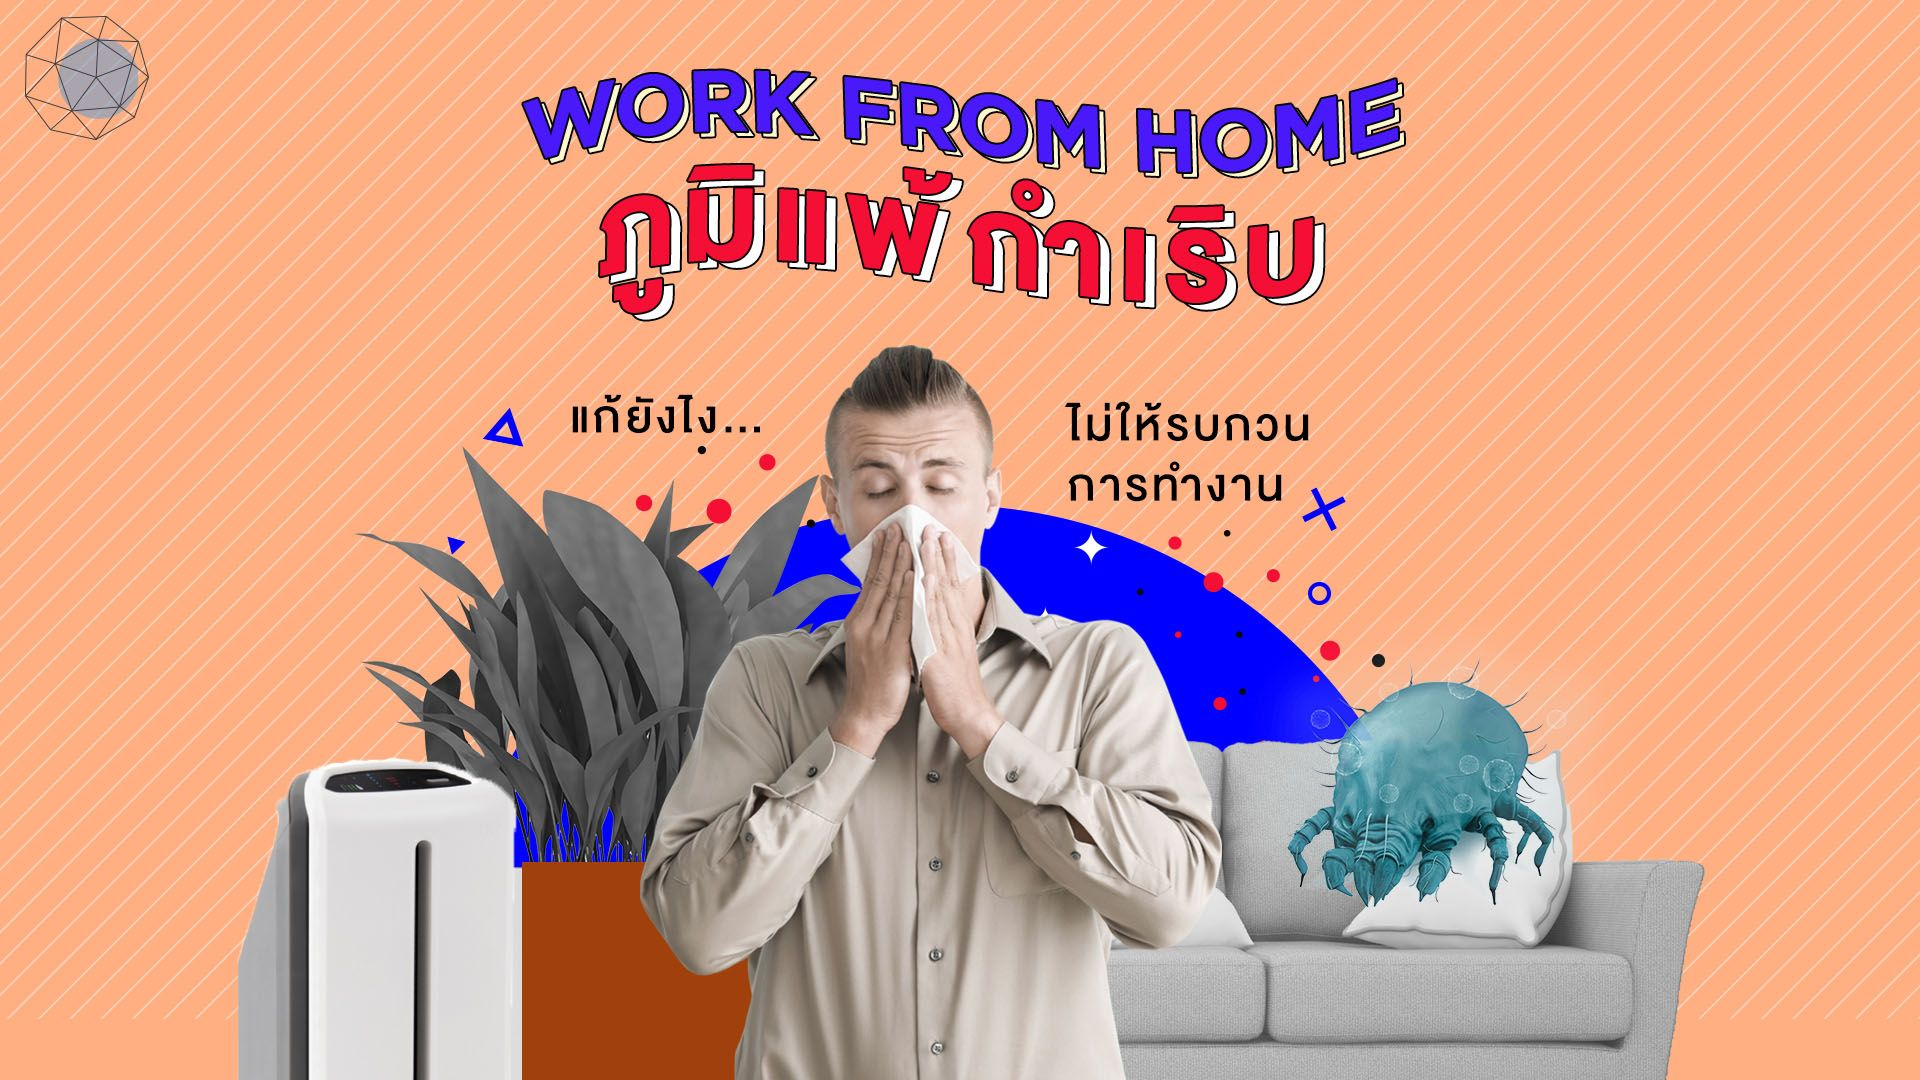 Work From Home ภูมิแพ้กำเริบ